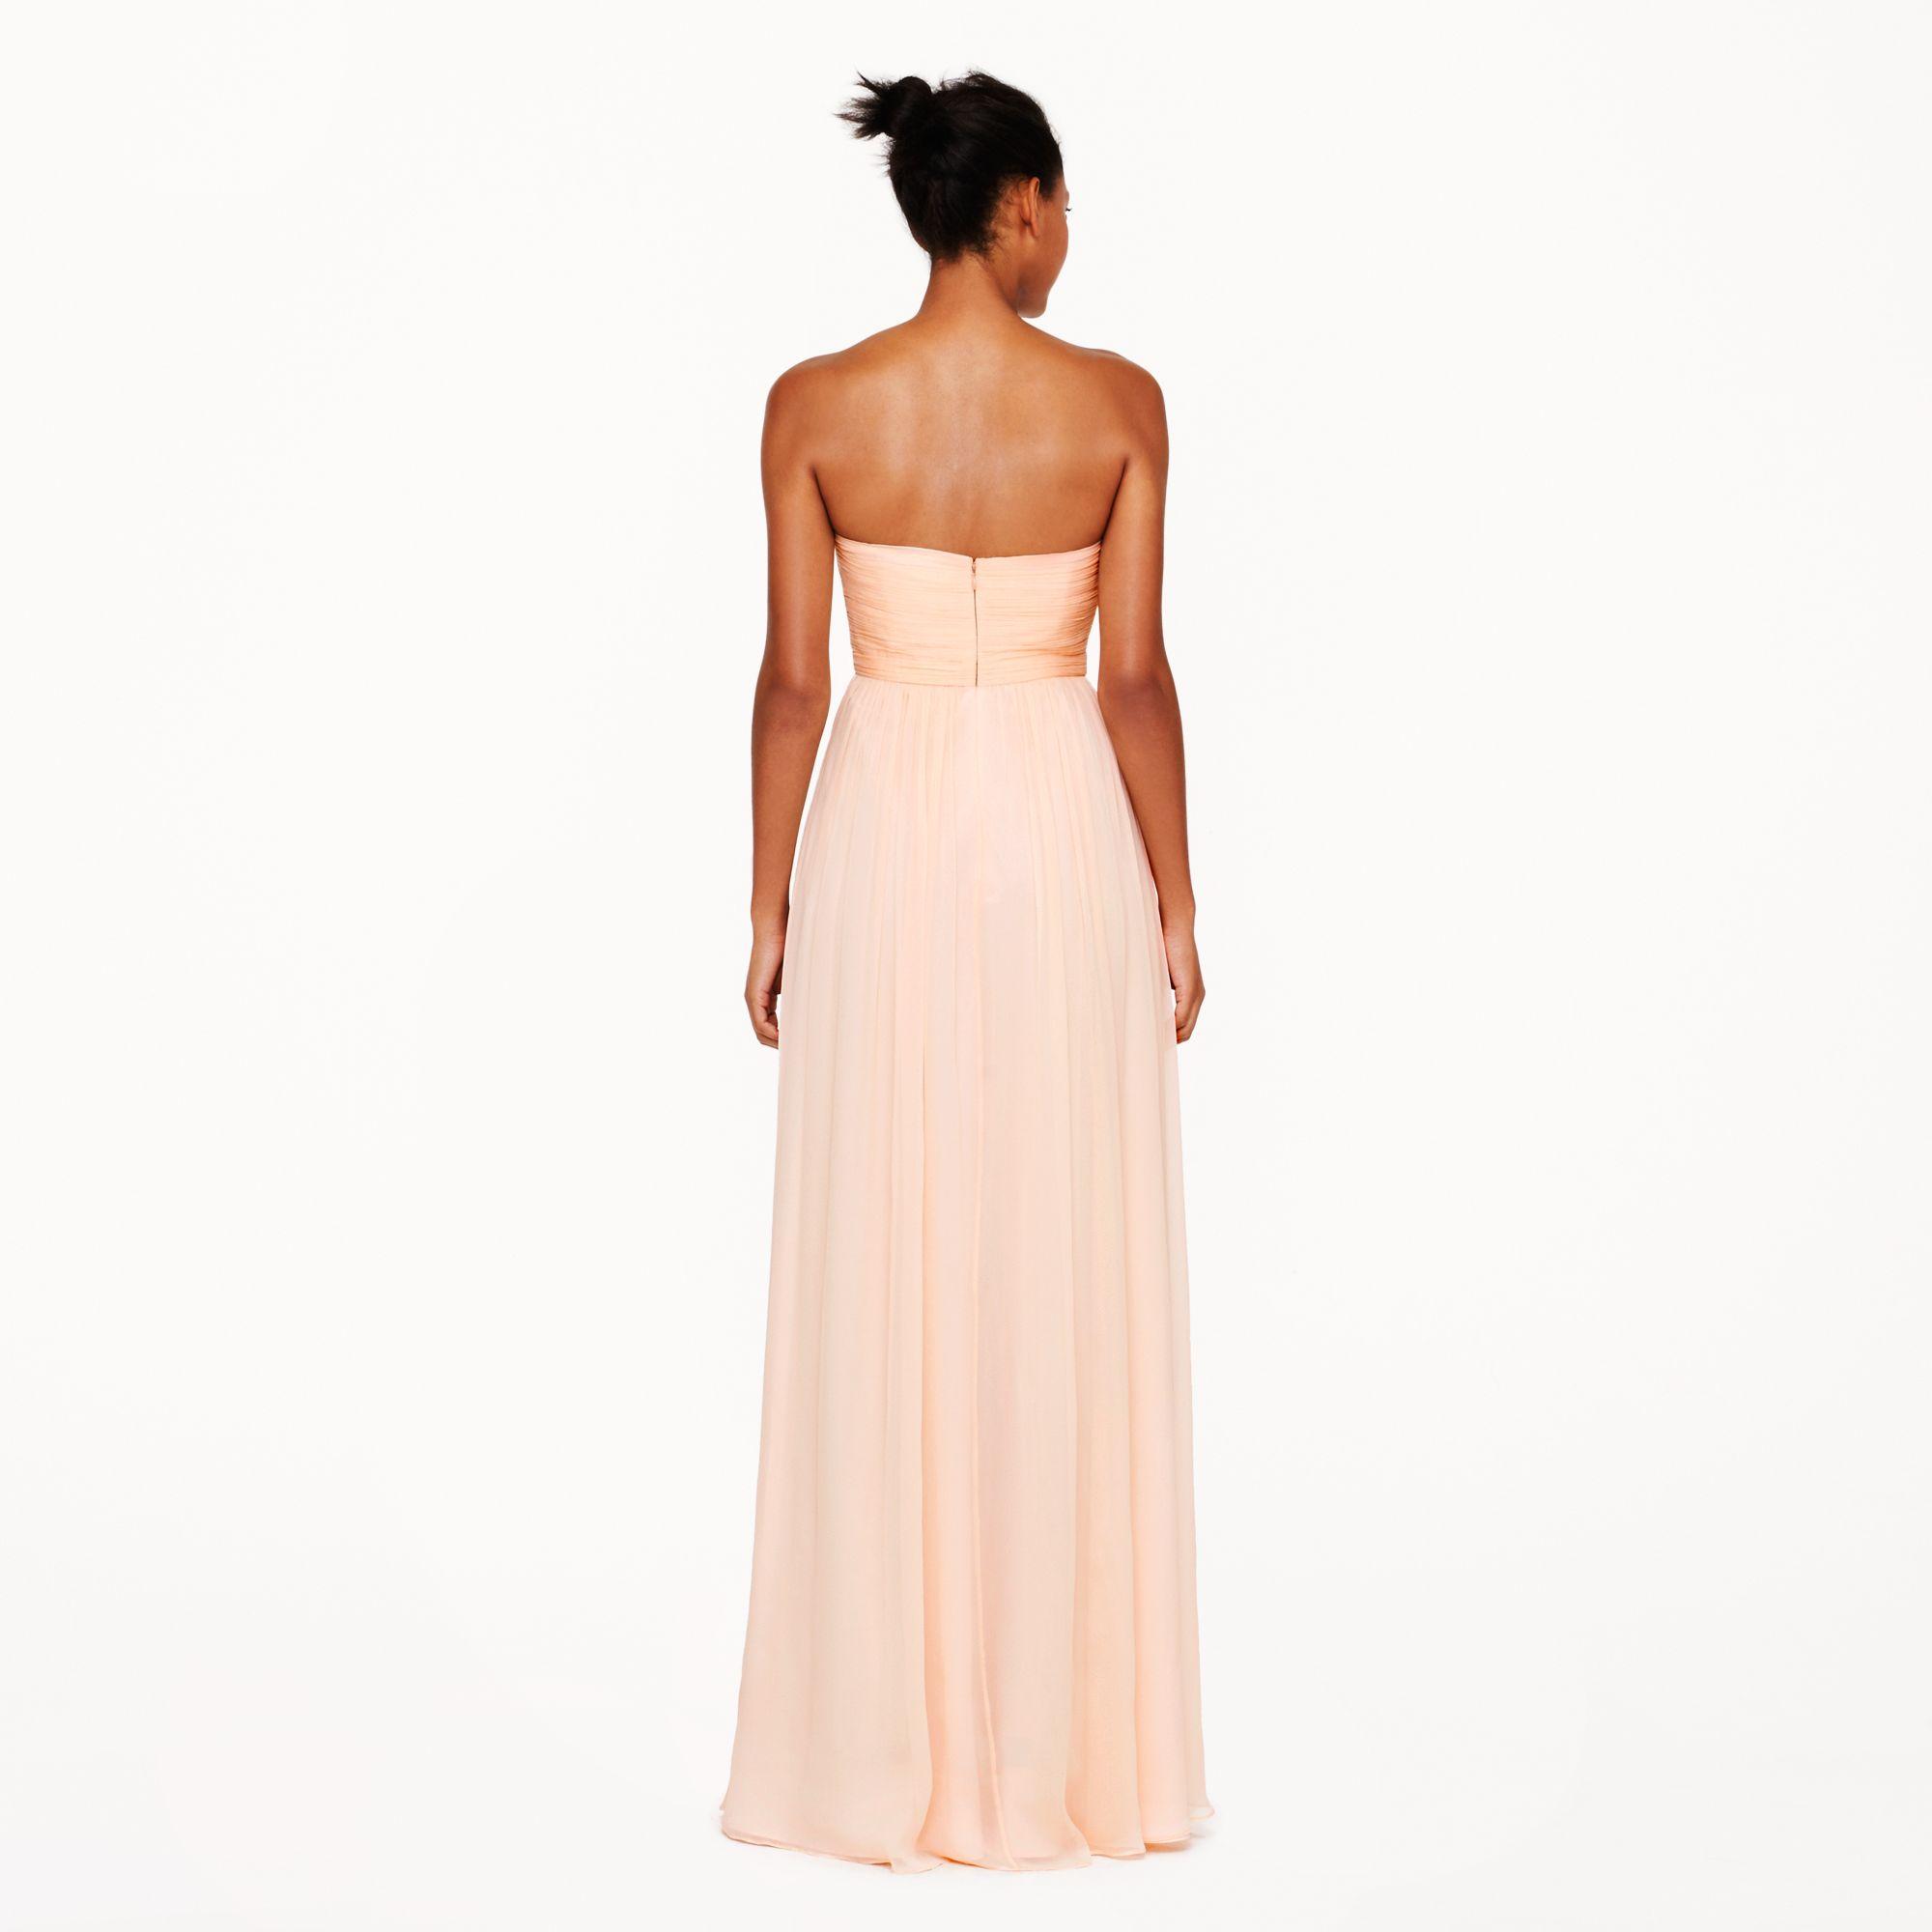 jcrew nadia dress size guide